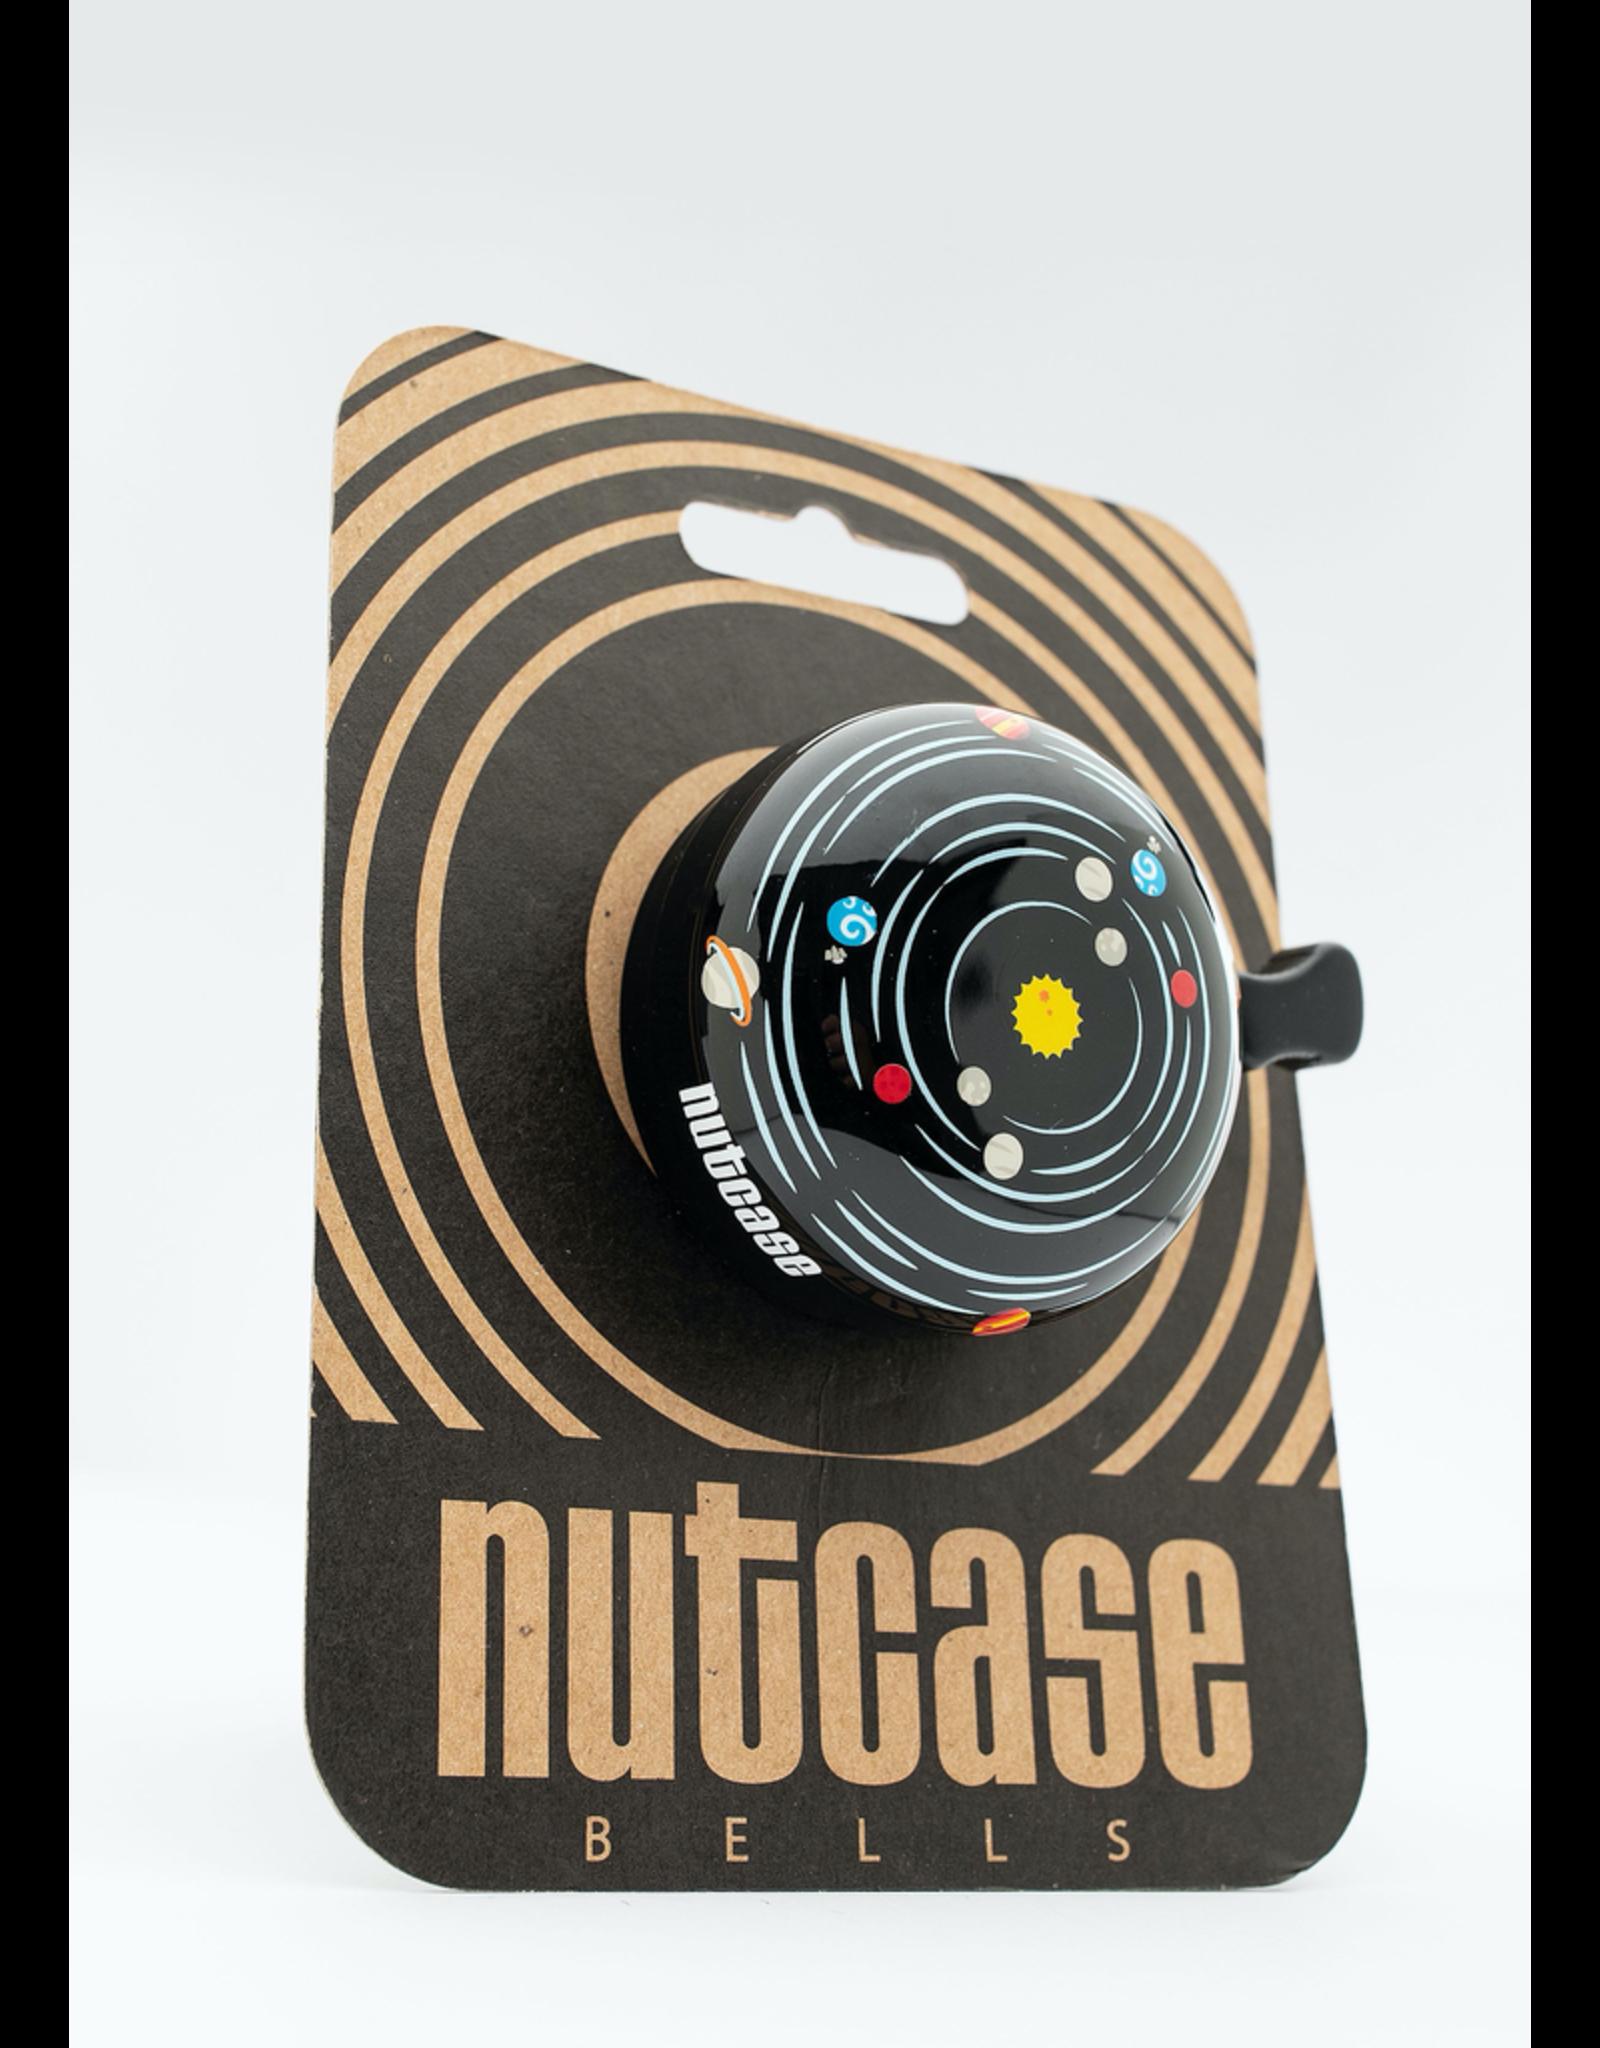 Nutcase Defy Gravity - Large Bell